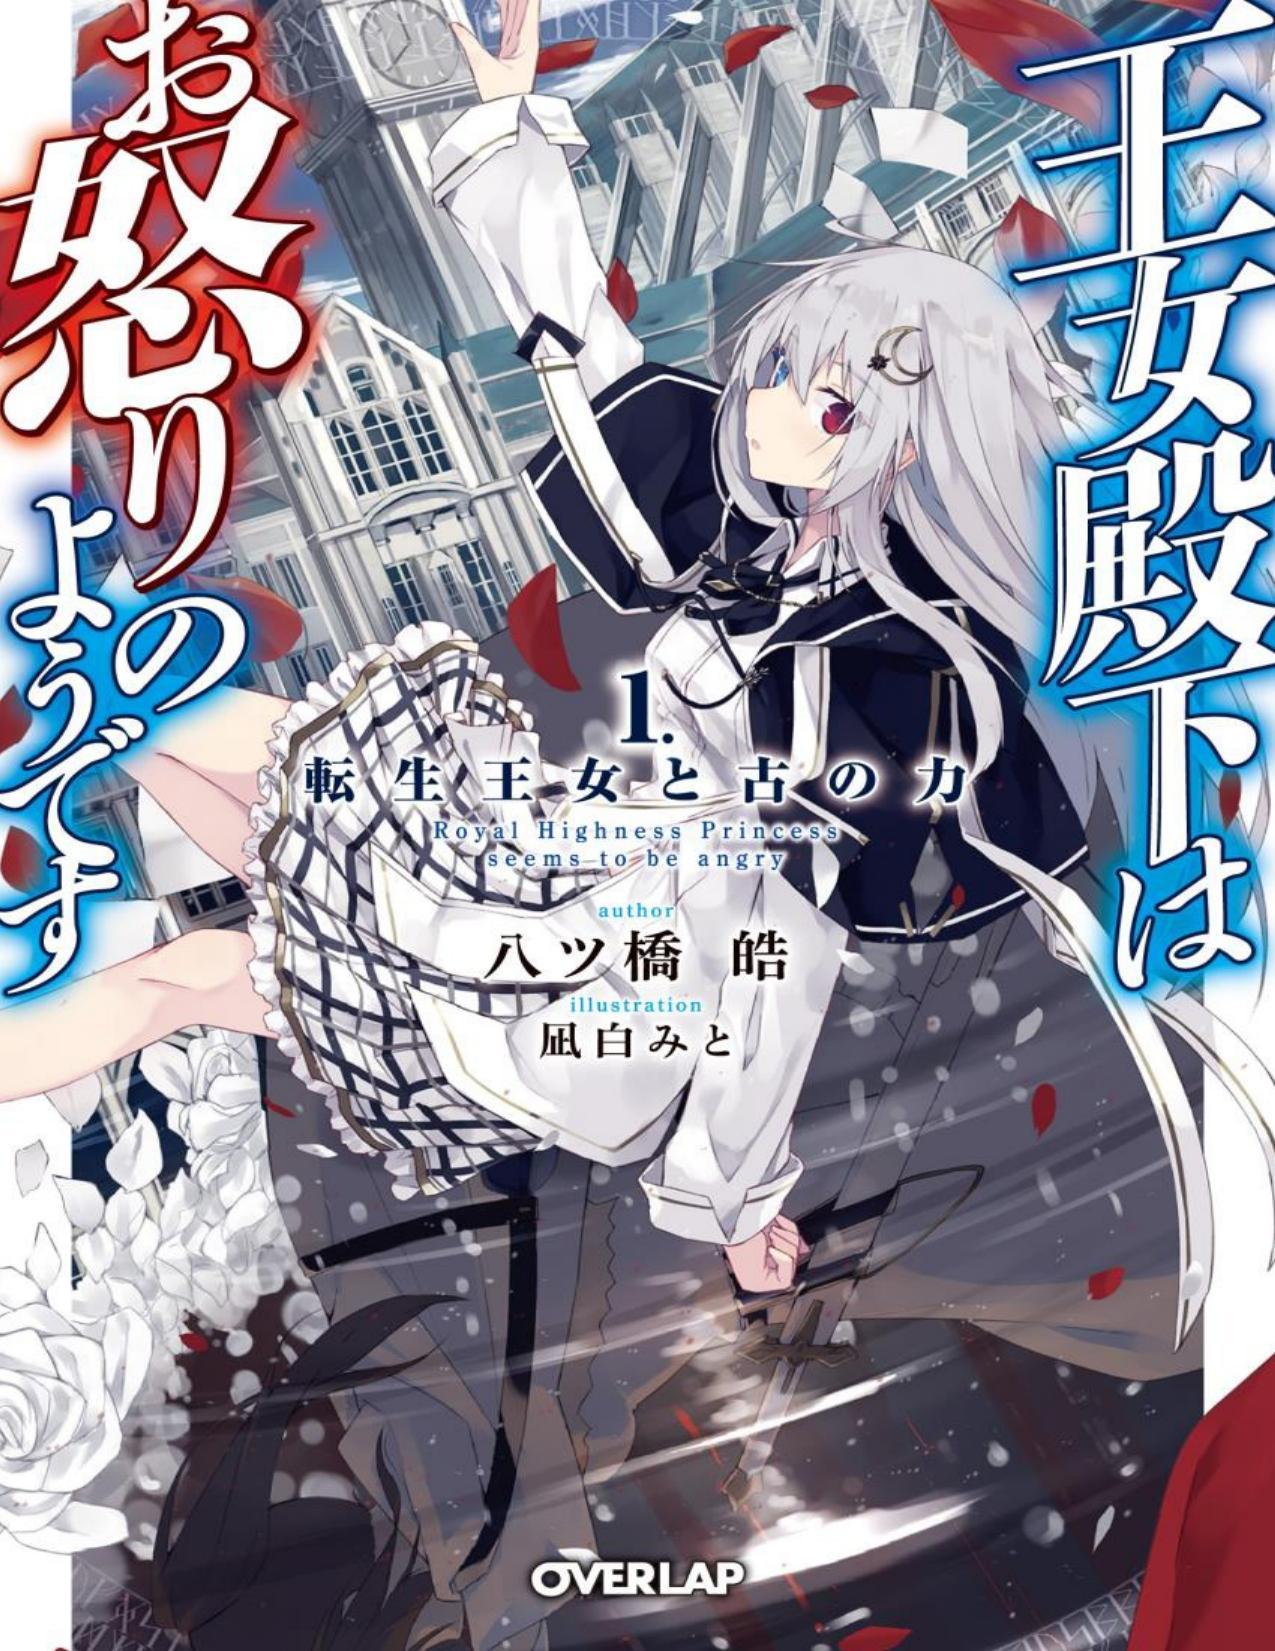 Her Royal Highness Seems to be Angry Volume 1 - Yatsuhashi Kou.jpg